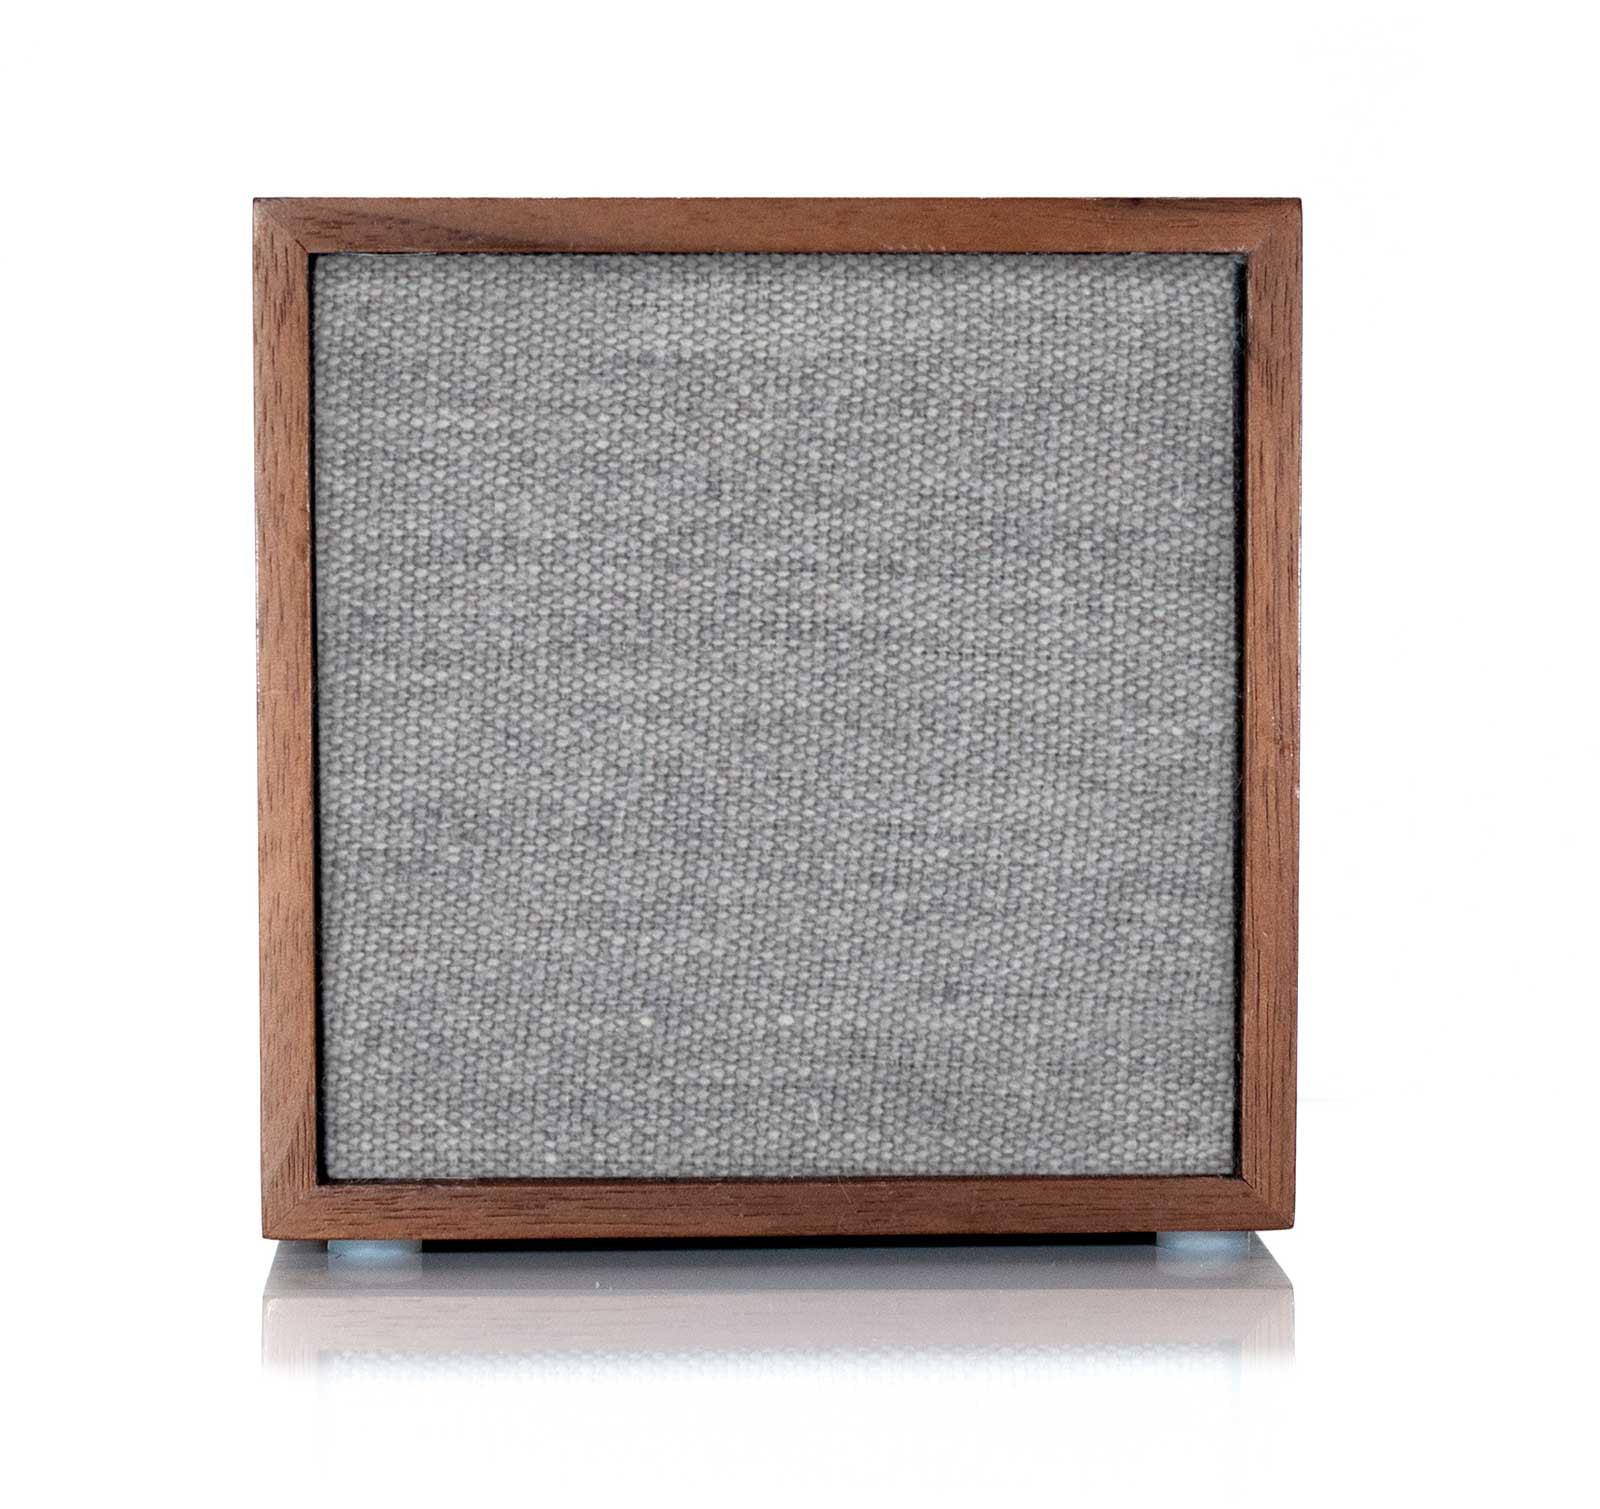 Tivoli CUBE Walnut Gray Wireless Speaker by Tivoli